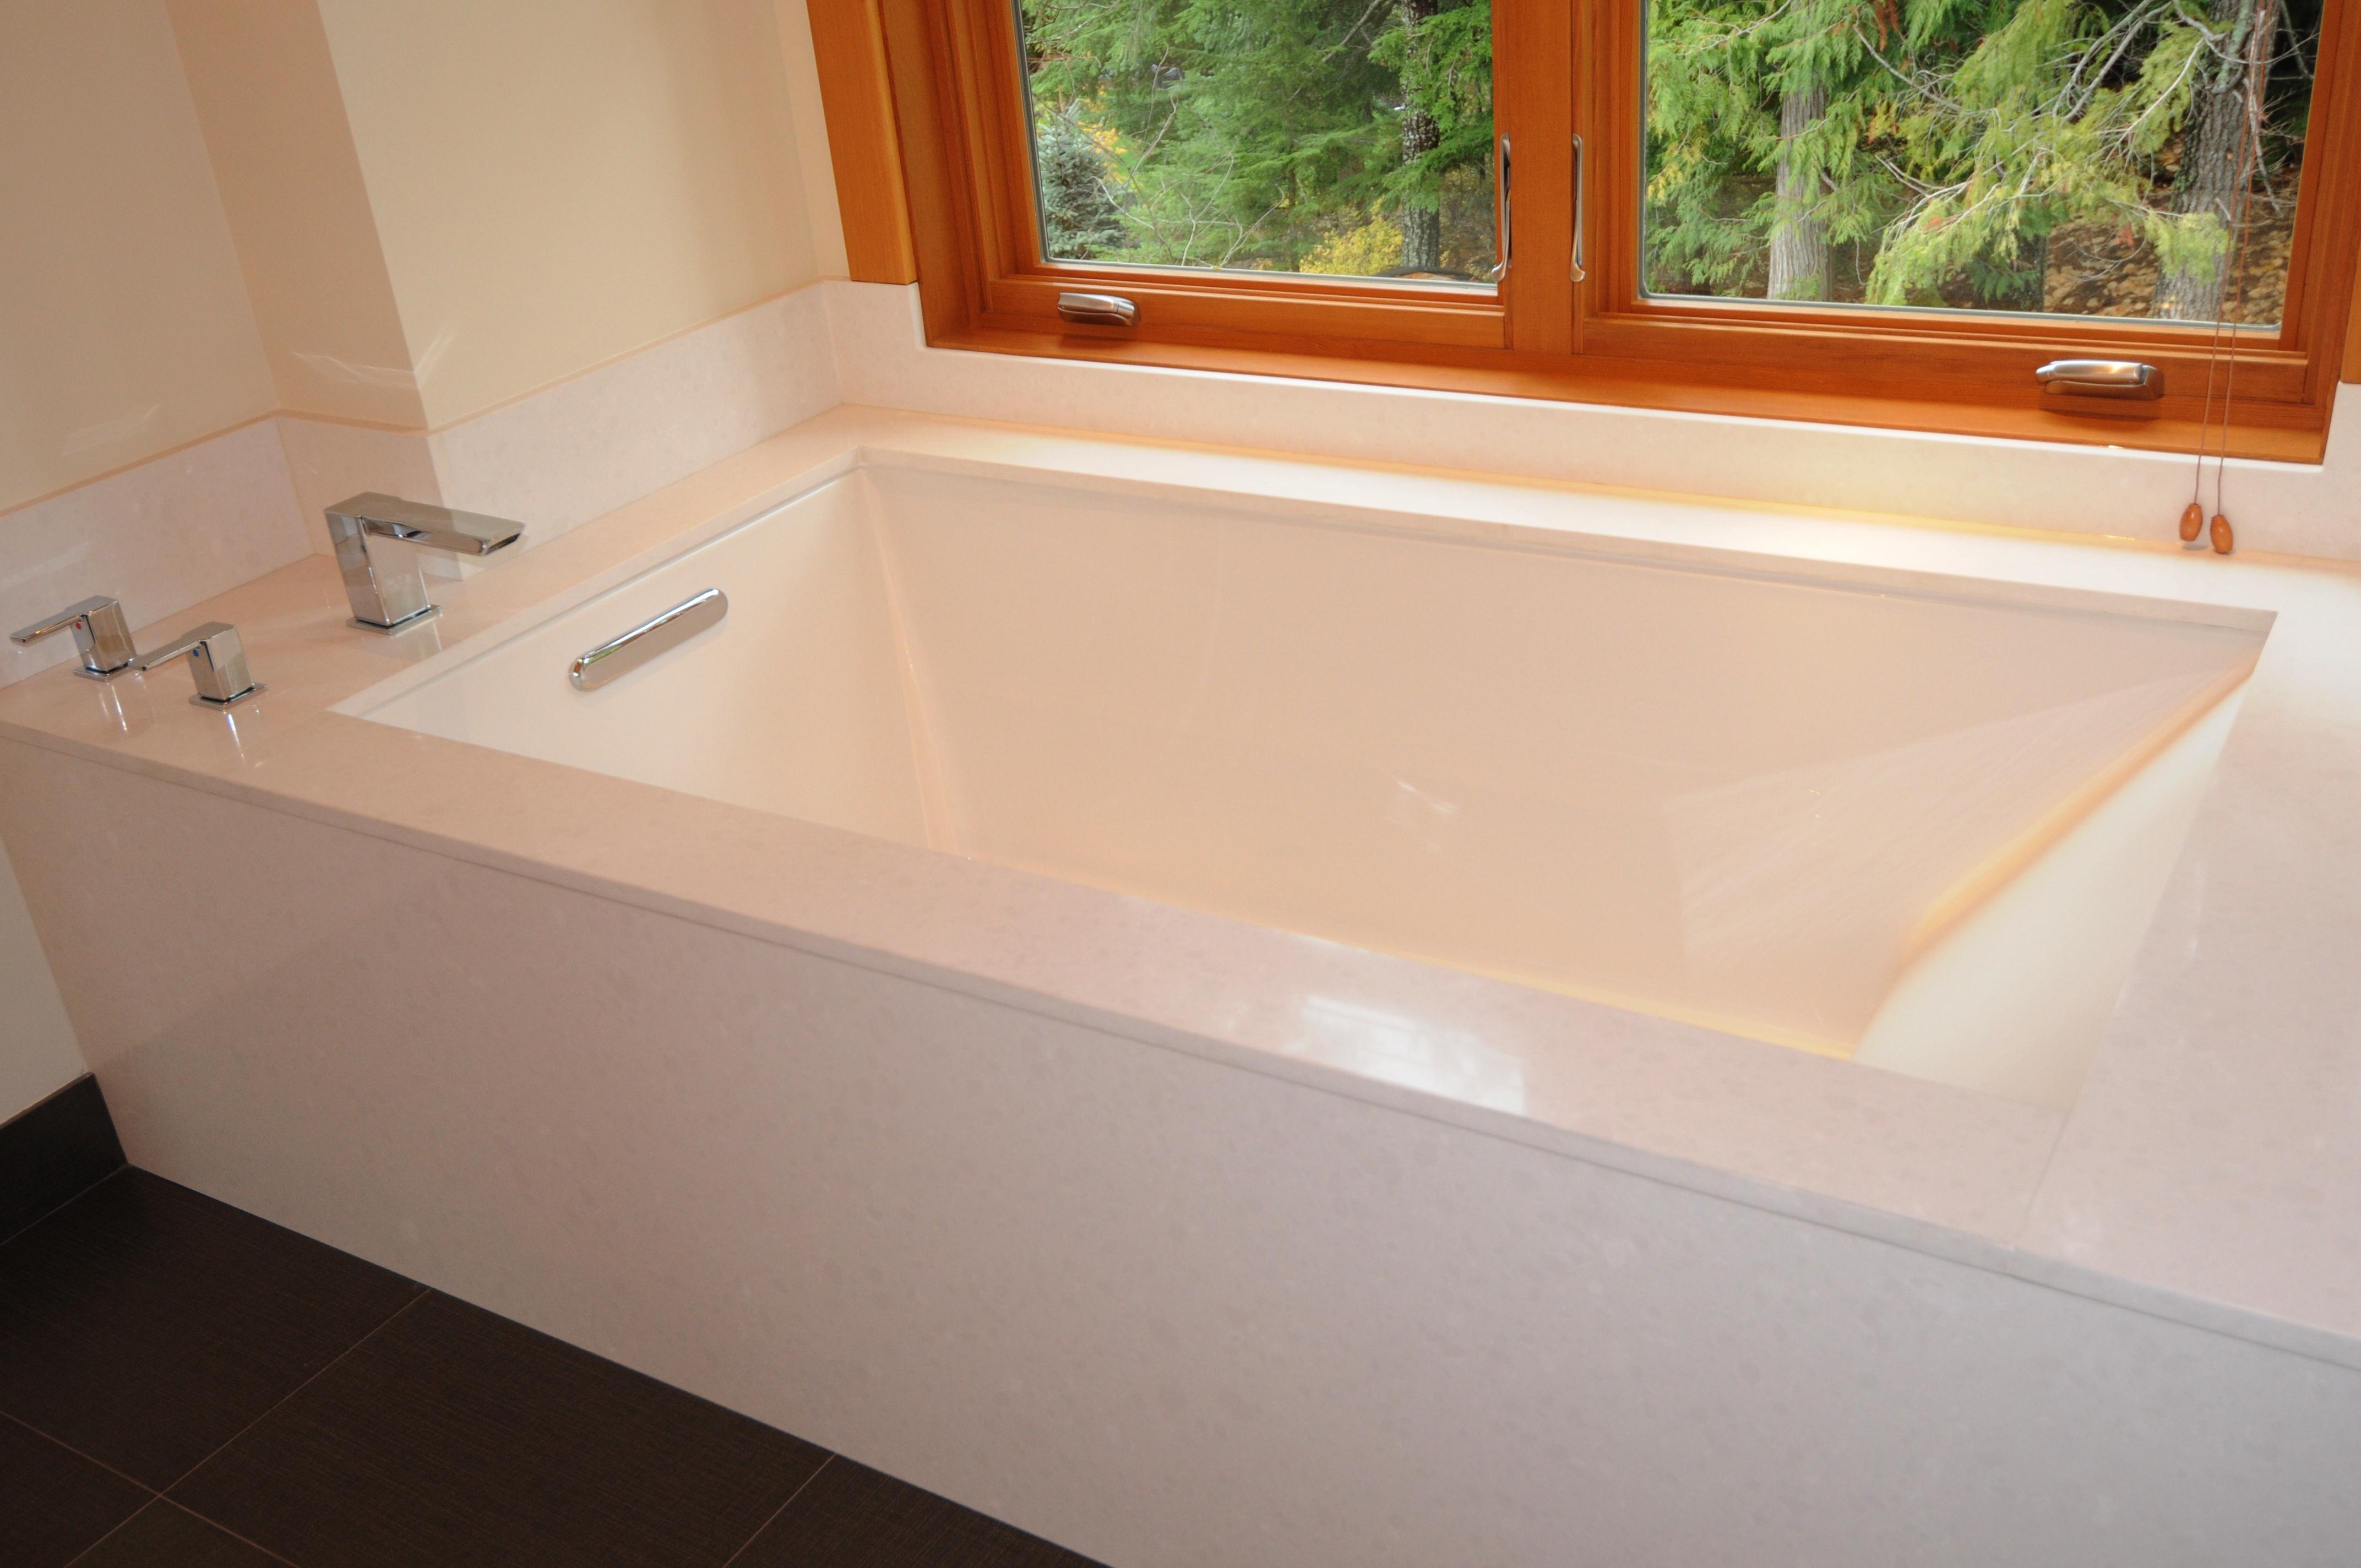 Two Panel Sliding Shower Bath Screen Kitchen Cabinet Storage Options Kitchen Cabinet 5 In